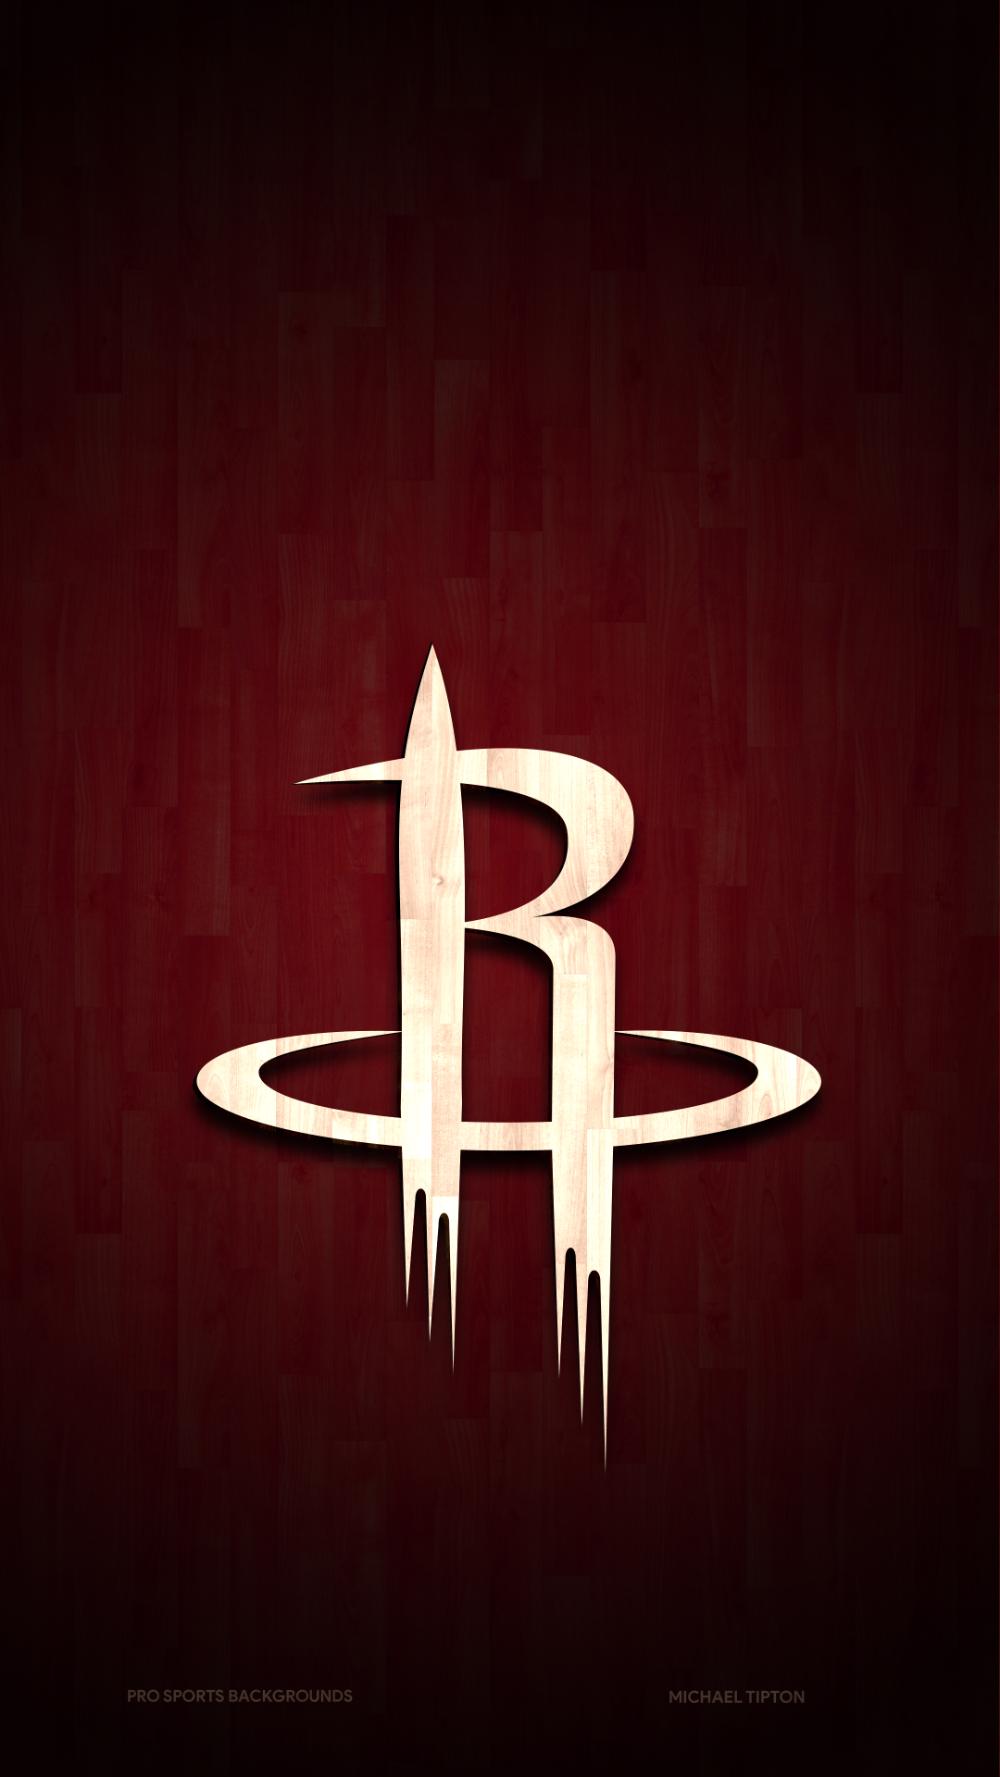 Houston Rockets Wallpapers Pro Sports Backgrounds In 2021 Houston Rockets Houston Nba Teams